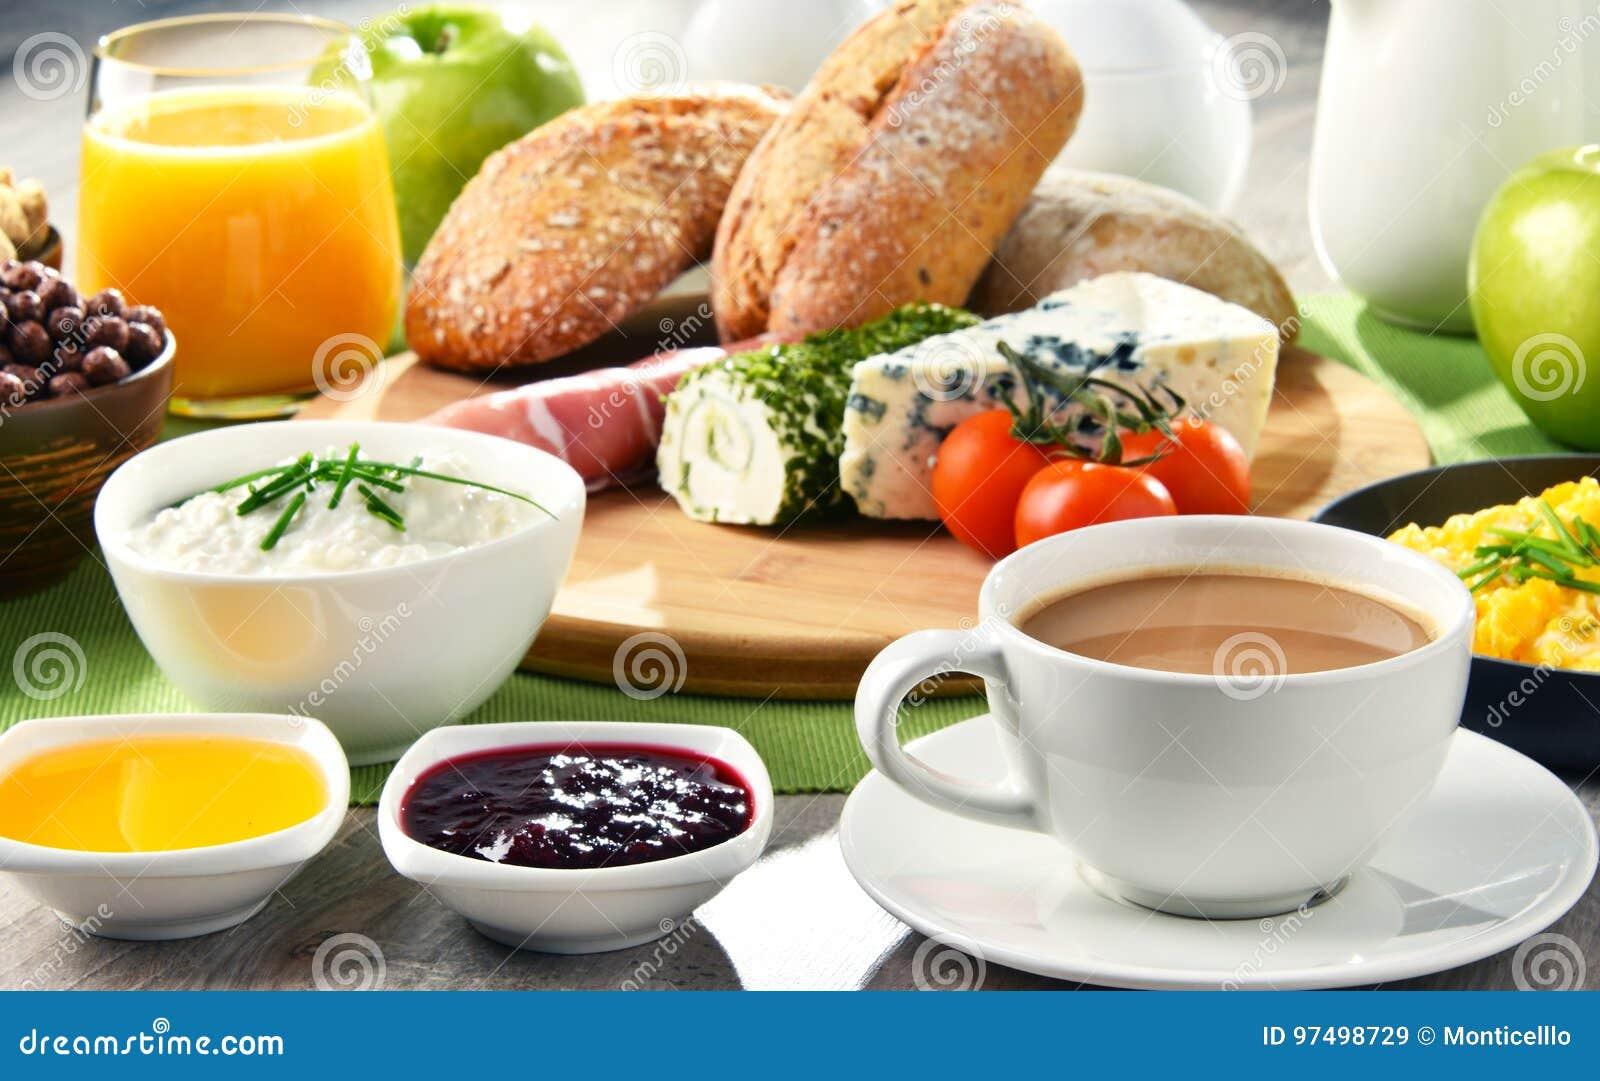 Ontbijt met koffie, kaas, graangewassen en roereieren wordt gediend dat